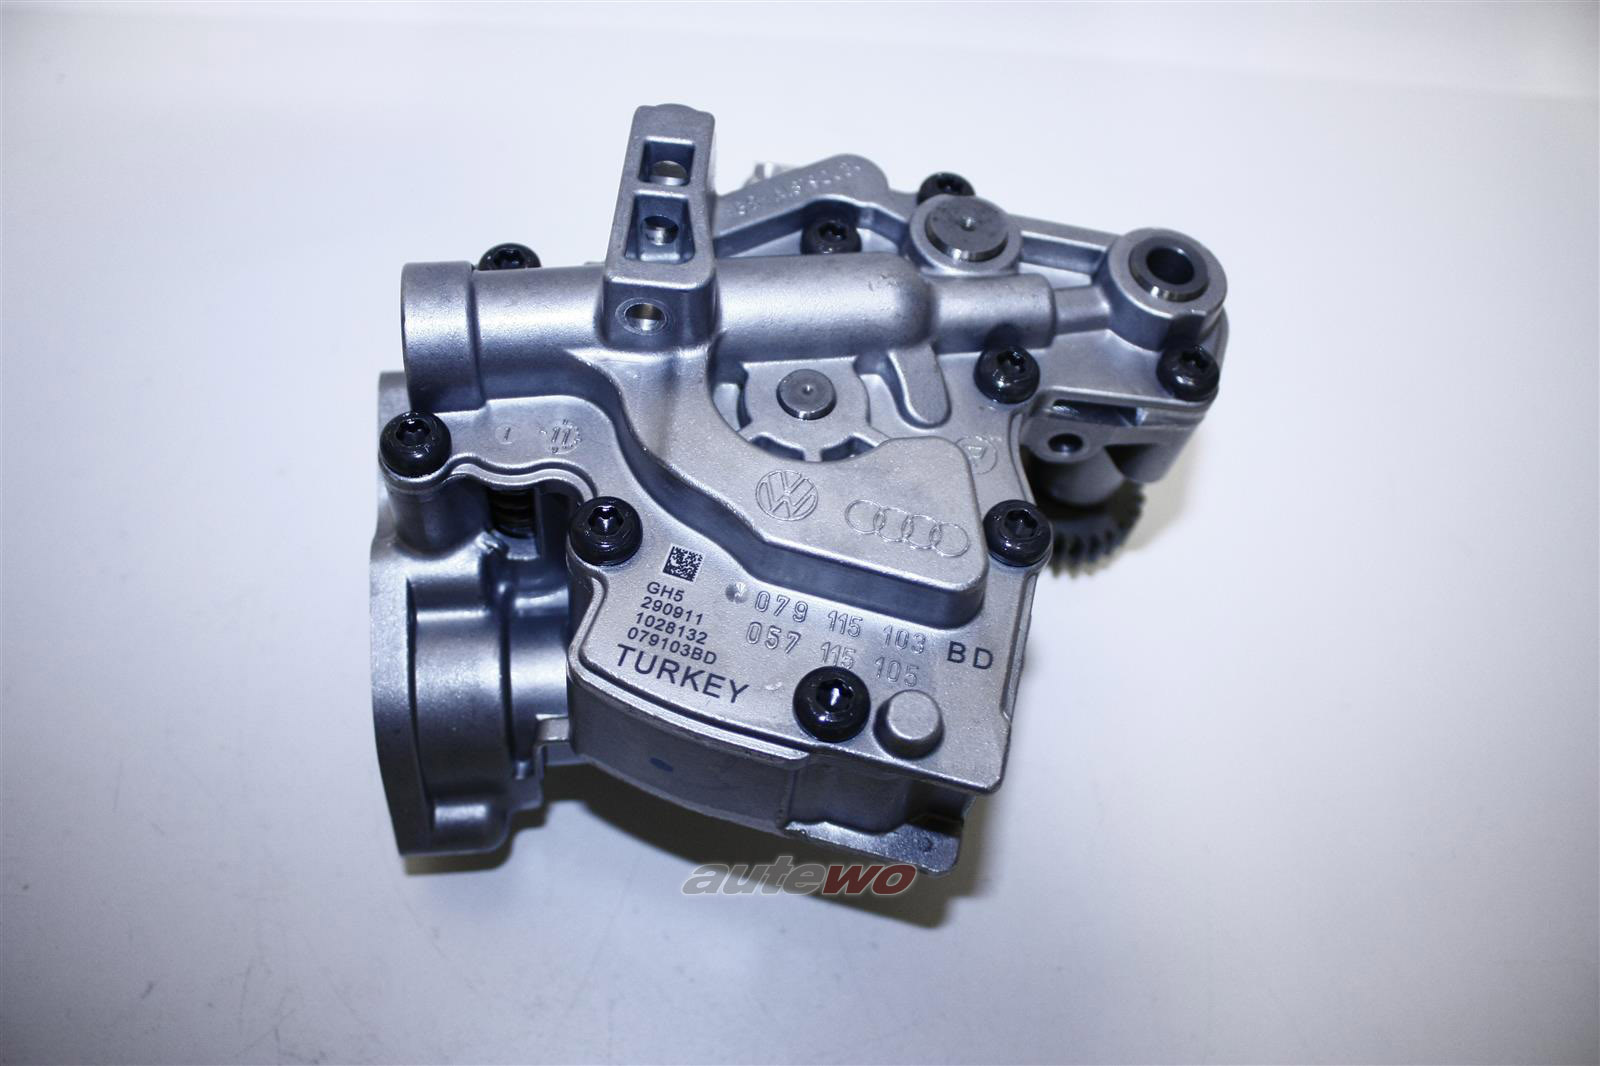 079115103BD NEU Audi S6/RS6 4G/S7/RS7/S8 D4 8 Zylinder Ölpumpe